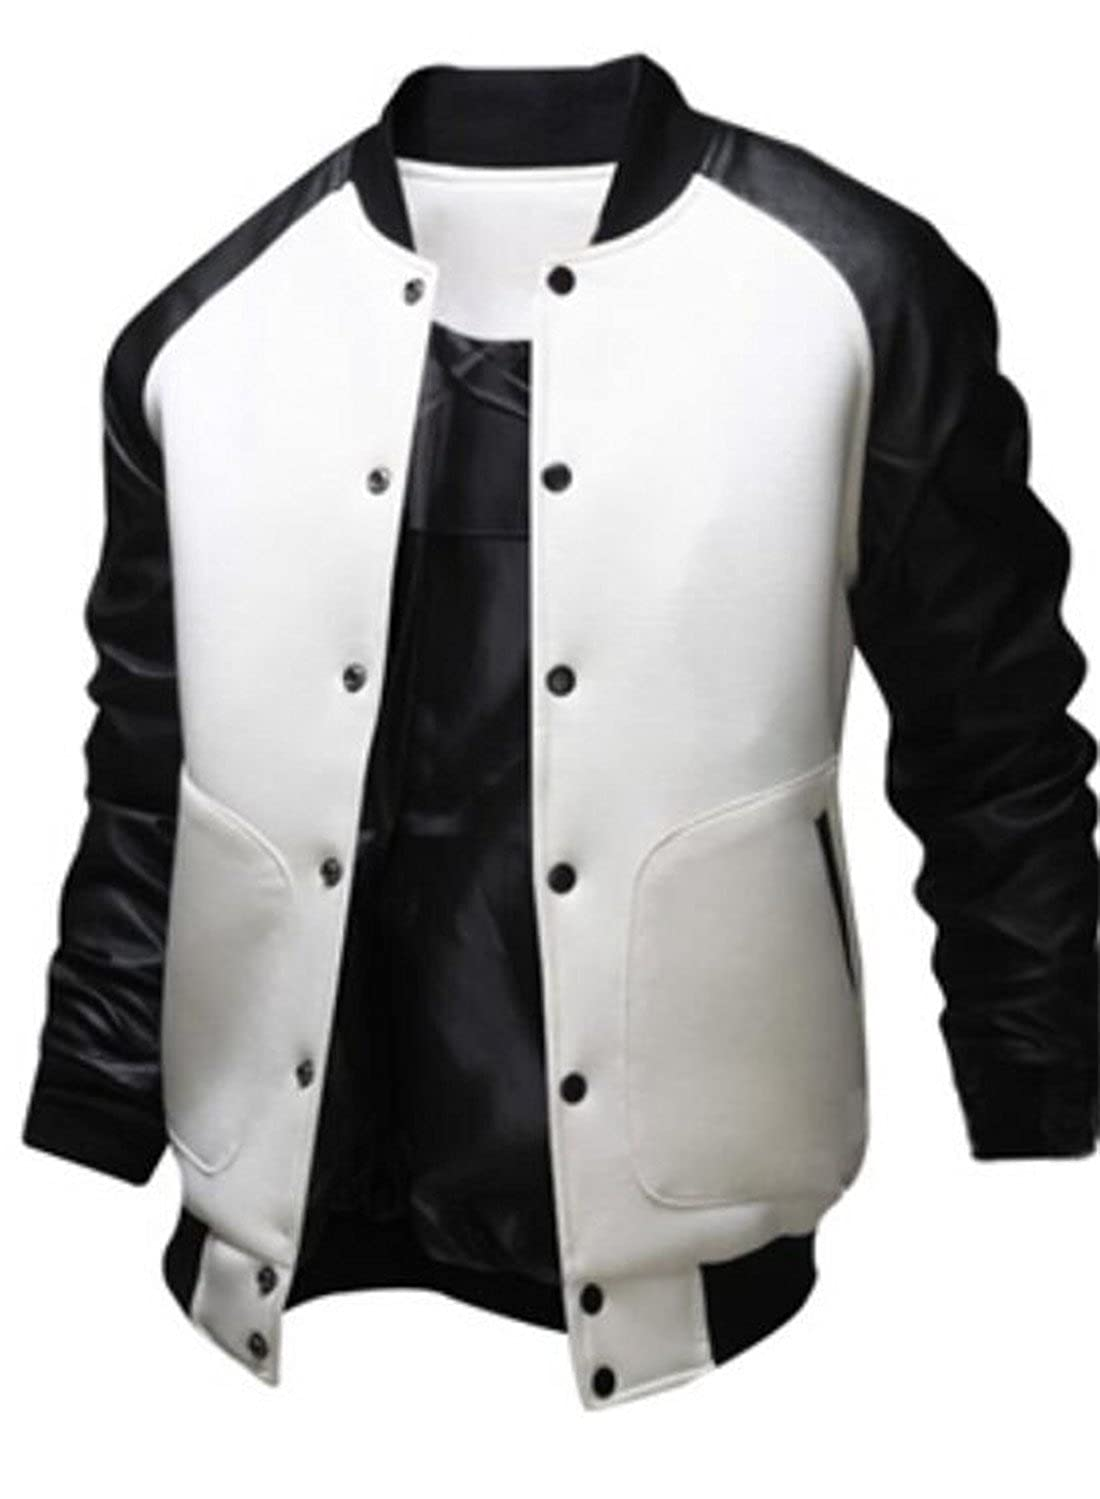 GRMO-Men Varsity Bomber Jackets Letterman Jacket Baseball Jacket Outwrear